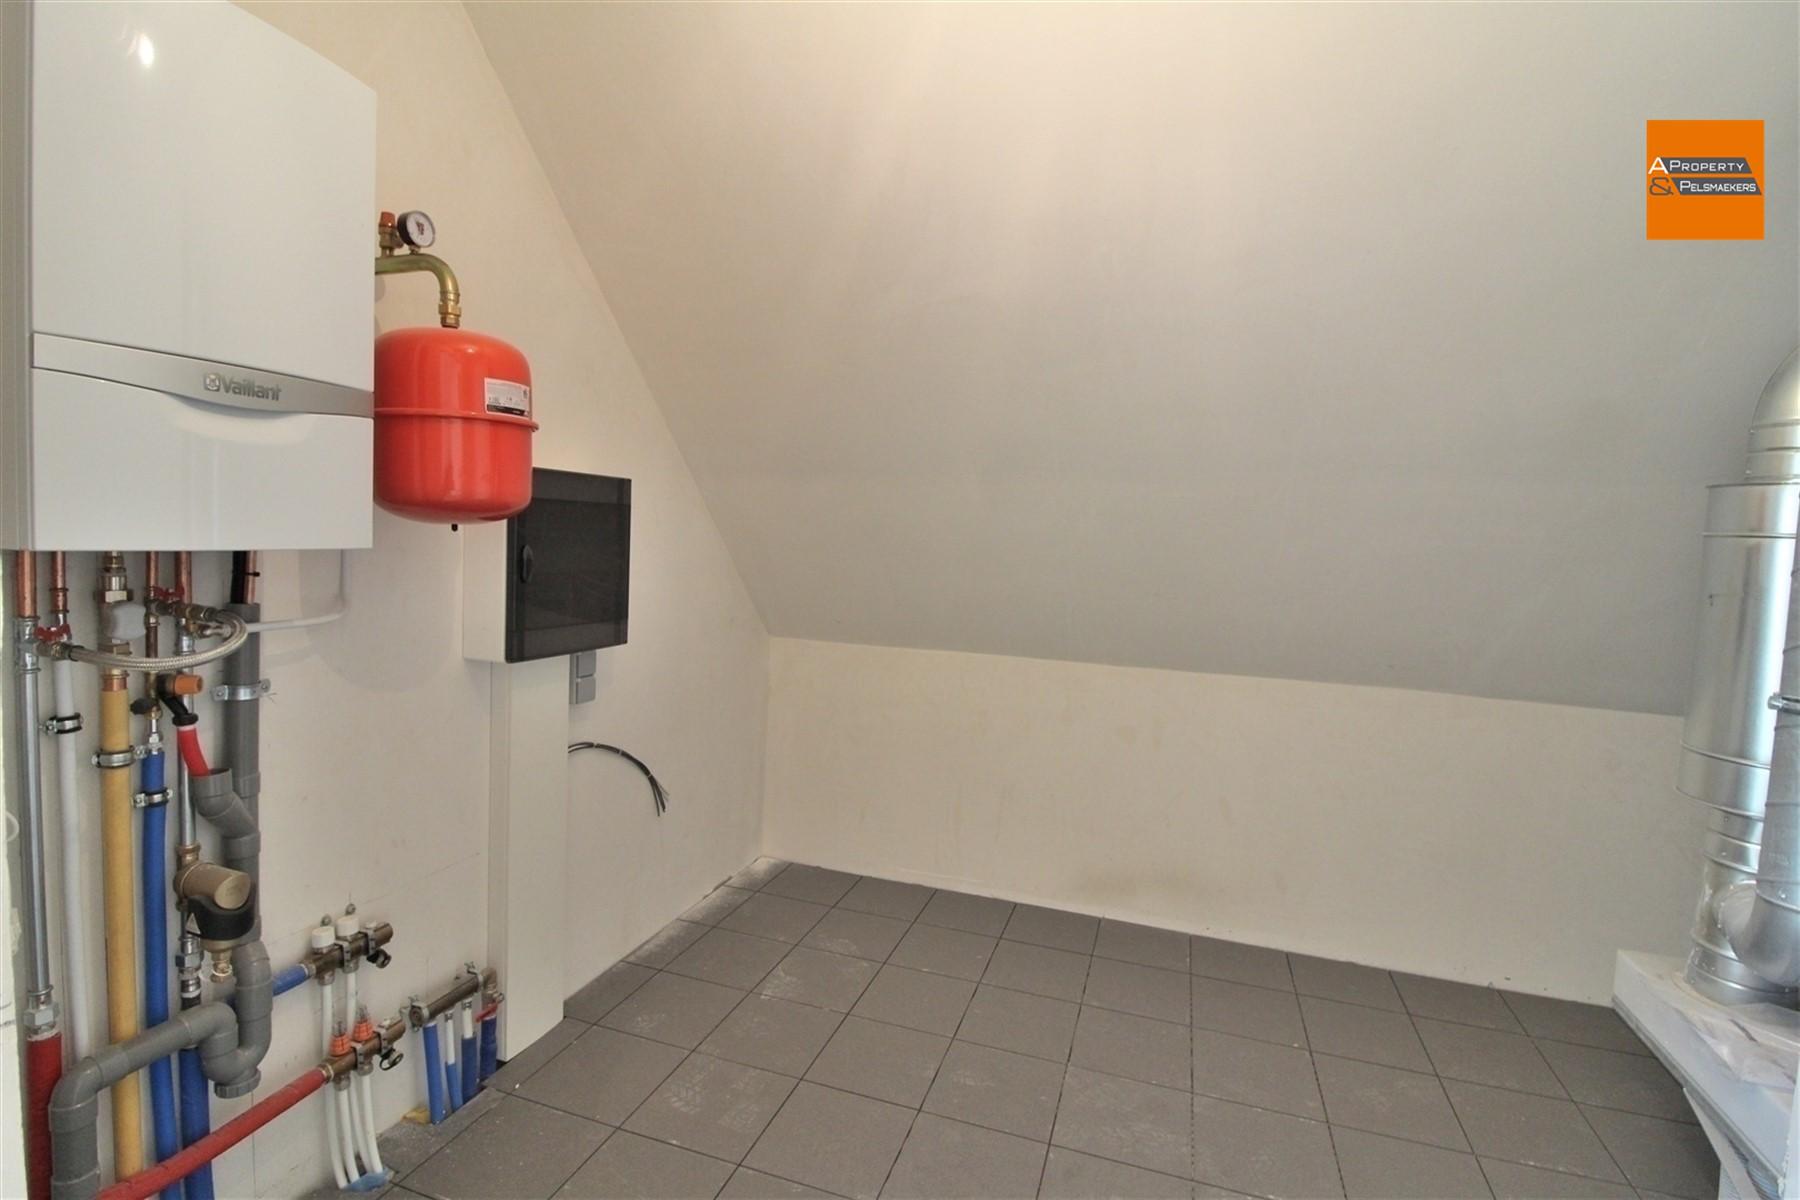 Foto 14 : Duplex/triplex in 3060 BERTEM (België) - Prijs € 319.000